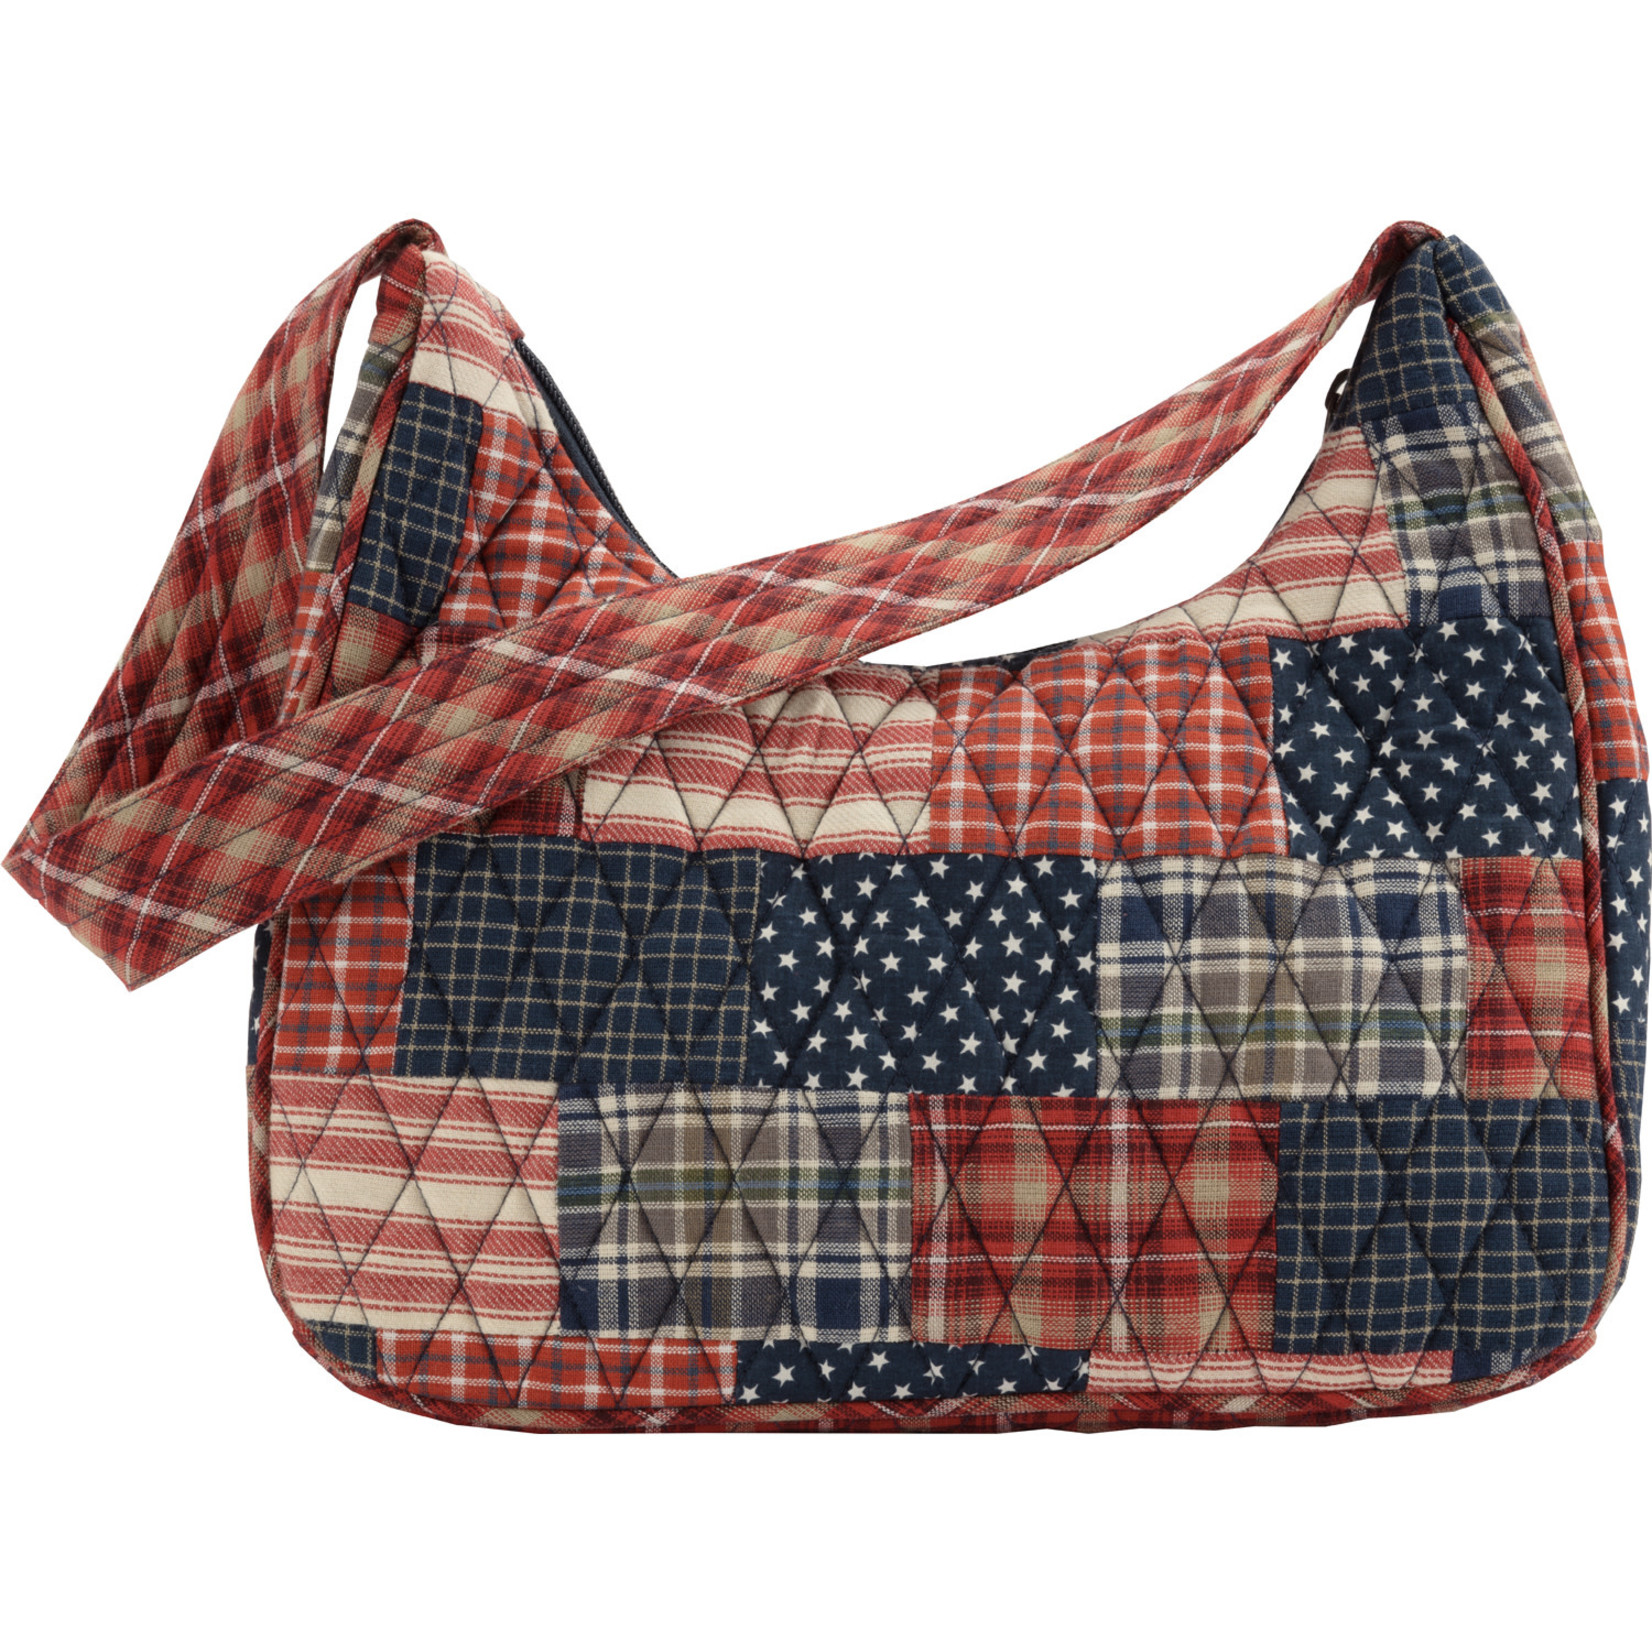 Bella Taylor Revere - Blakely handbag